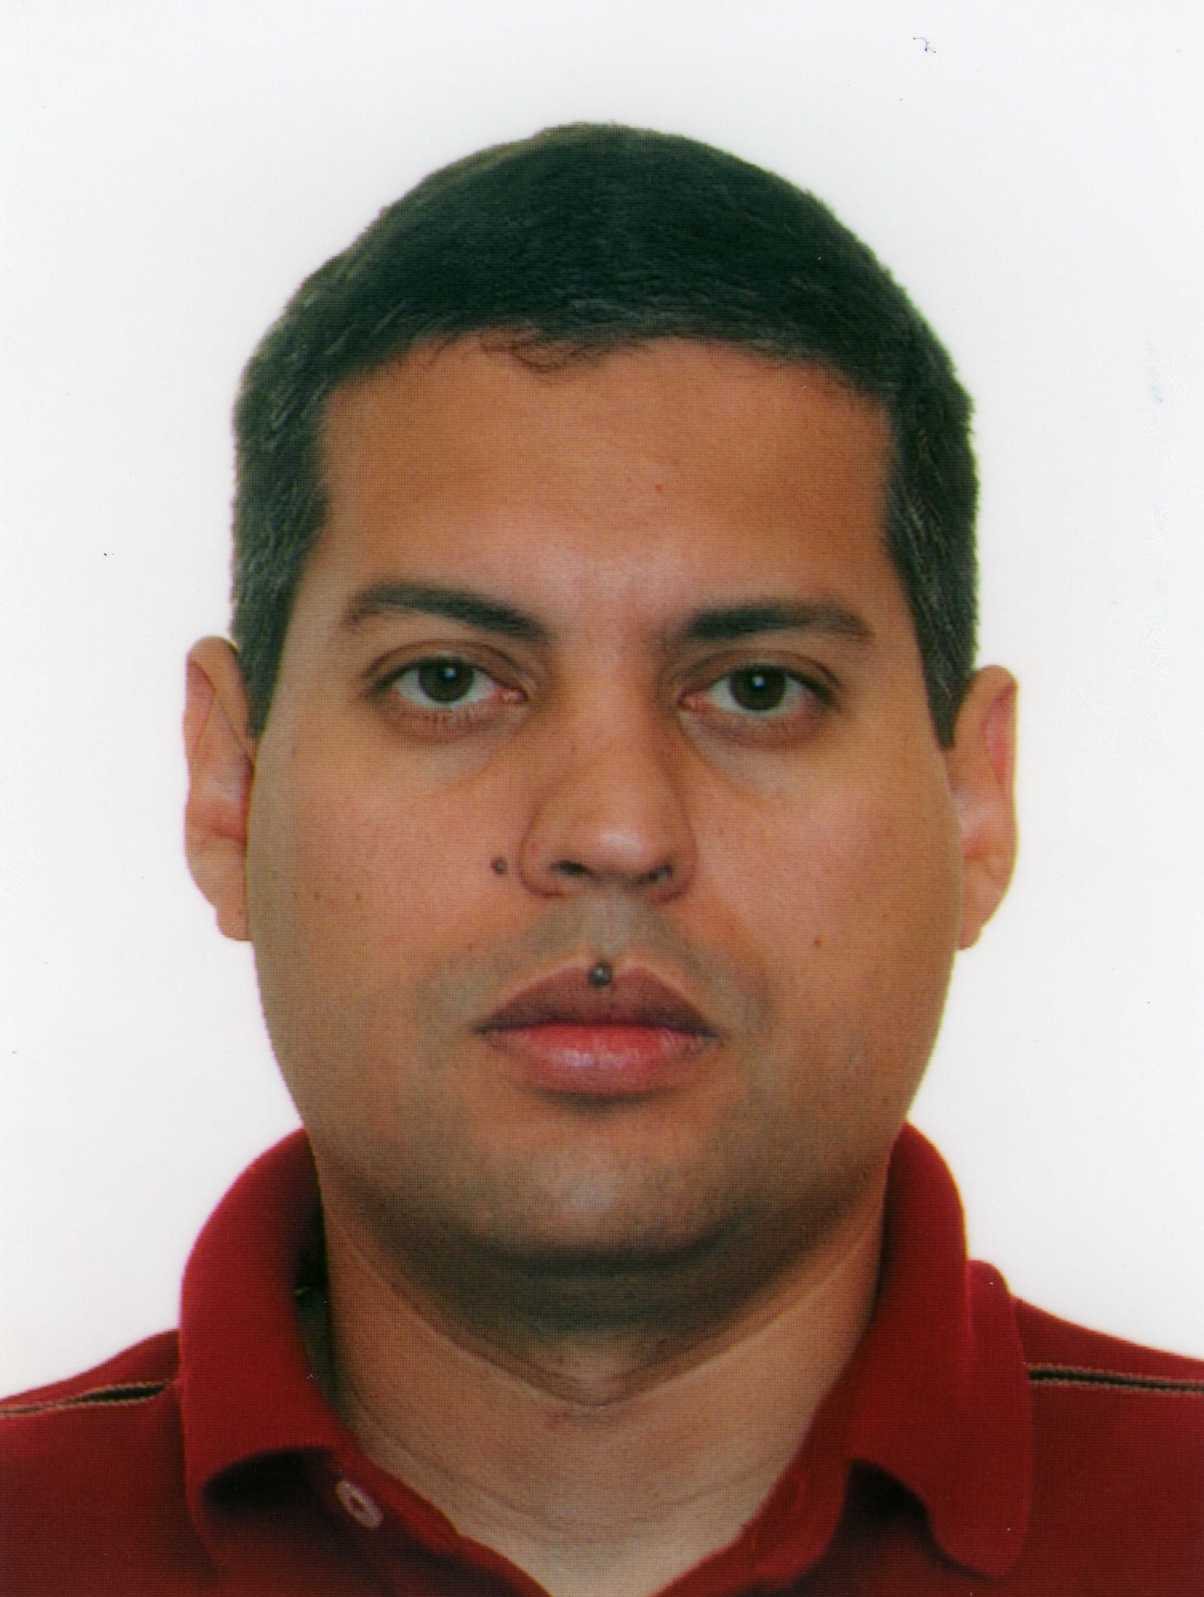 Jorge-Luis Pérez-Medina